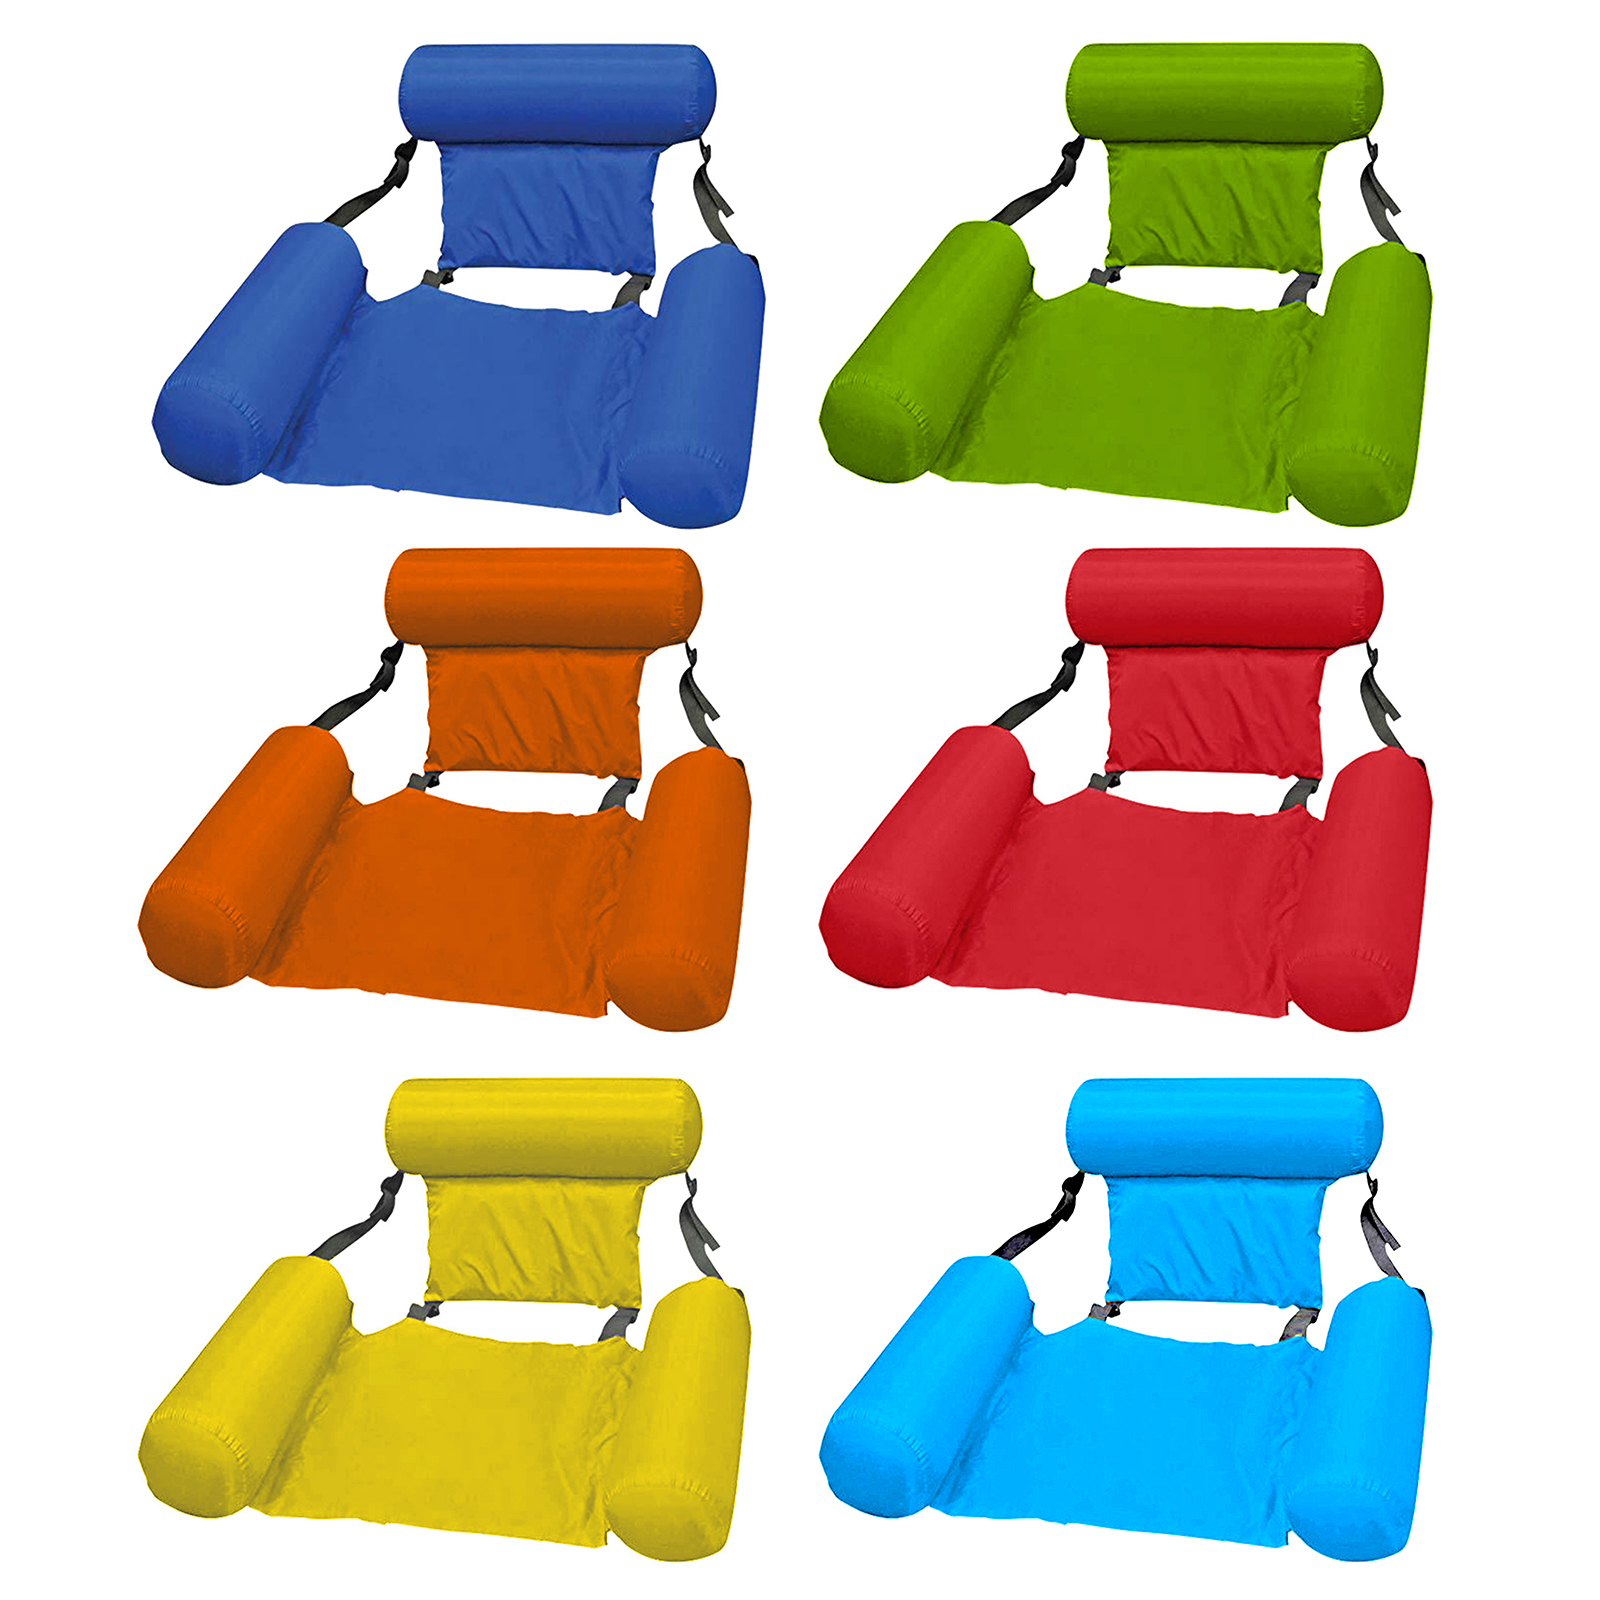 Water Floating Bed Swimming Pool Hammock Inflatable Water Longue with Backrest Ergonomic Anti-Leakage Sleeping Cushion